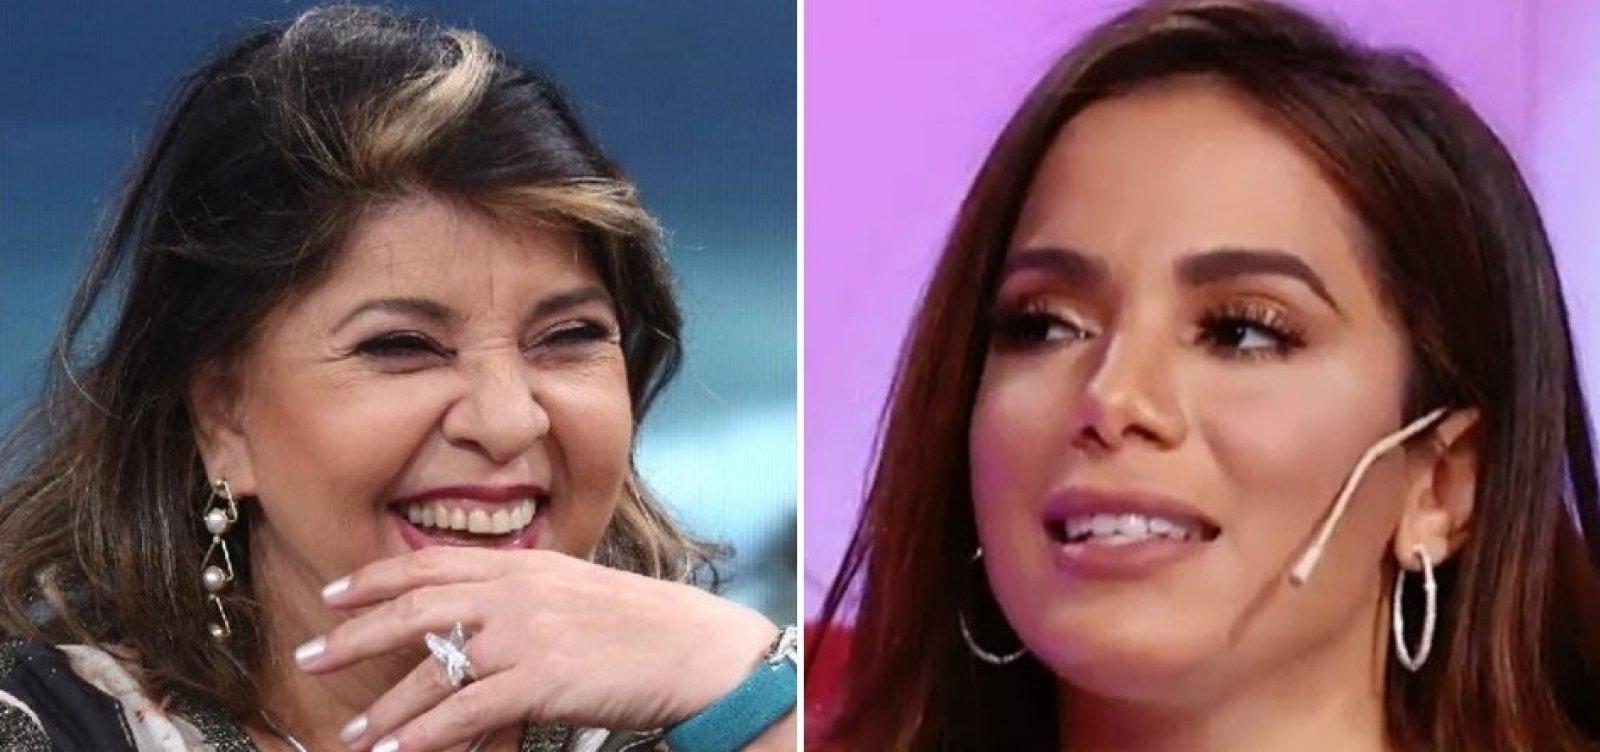 [Roberta Miranda parabeniza Anitta por gravidez e funkeira rebate: 'Me erra']